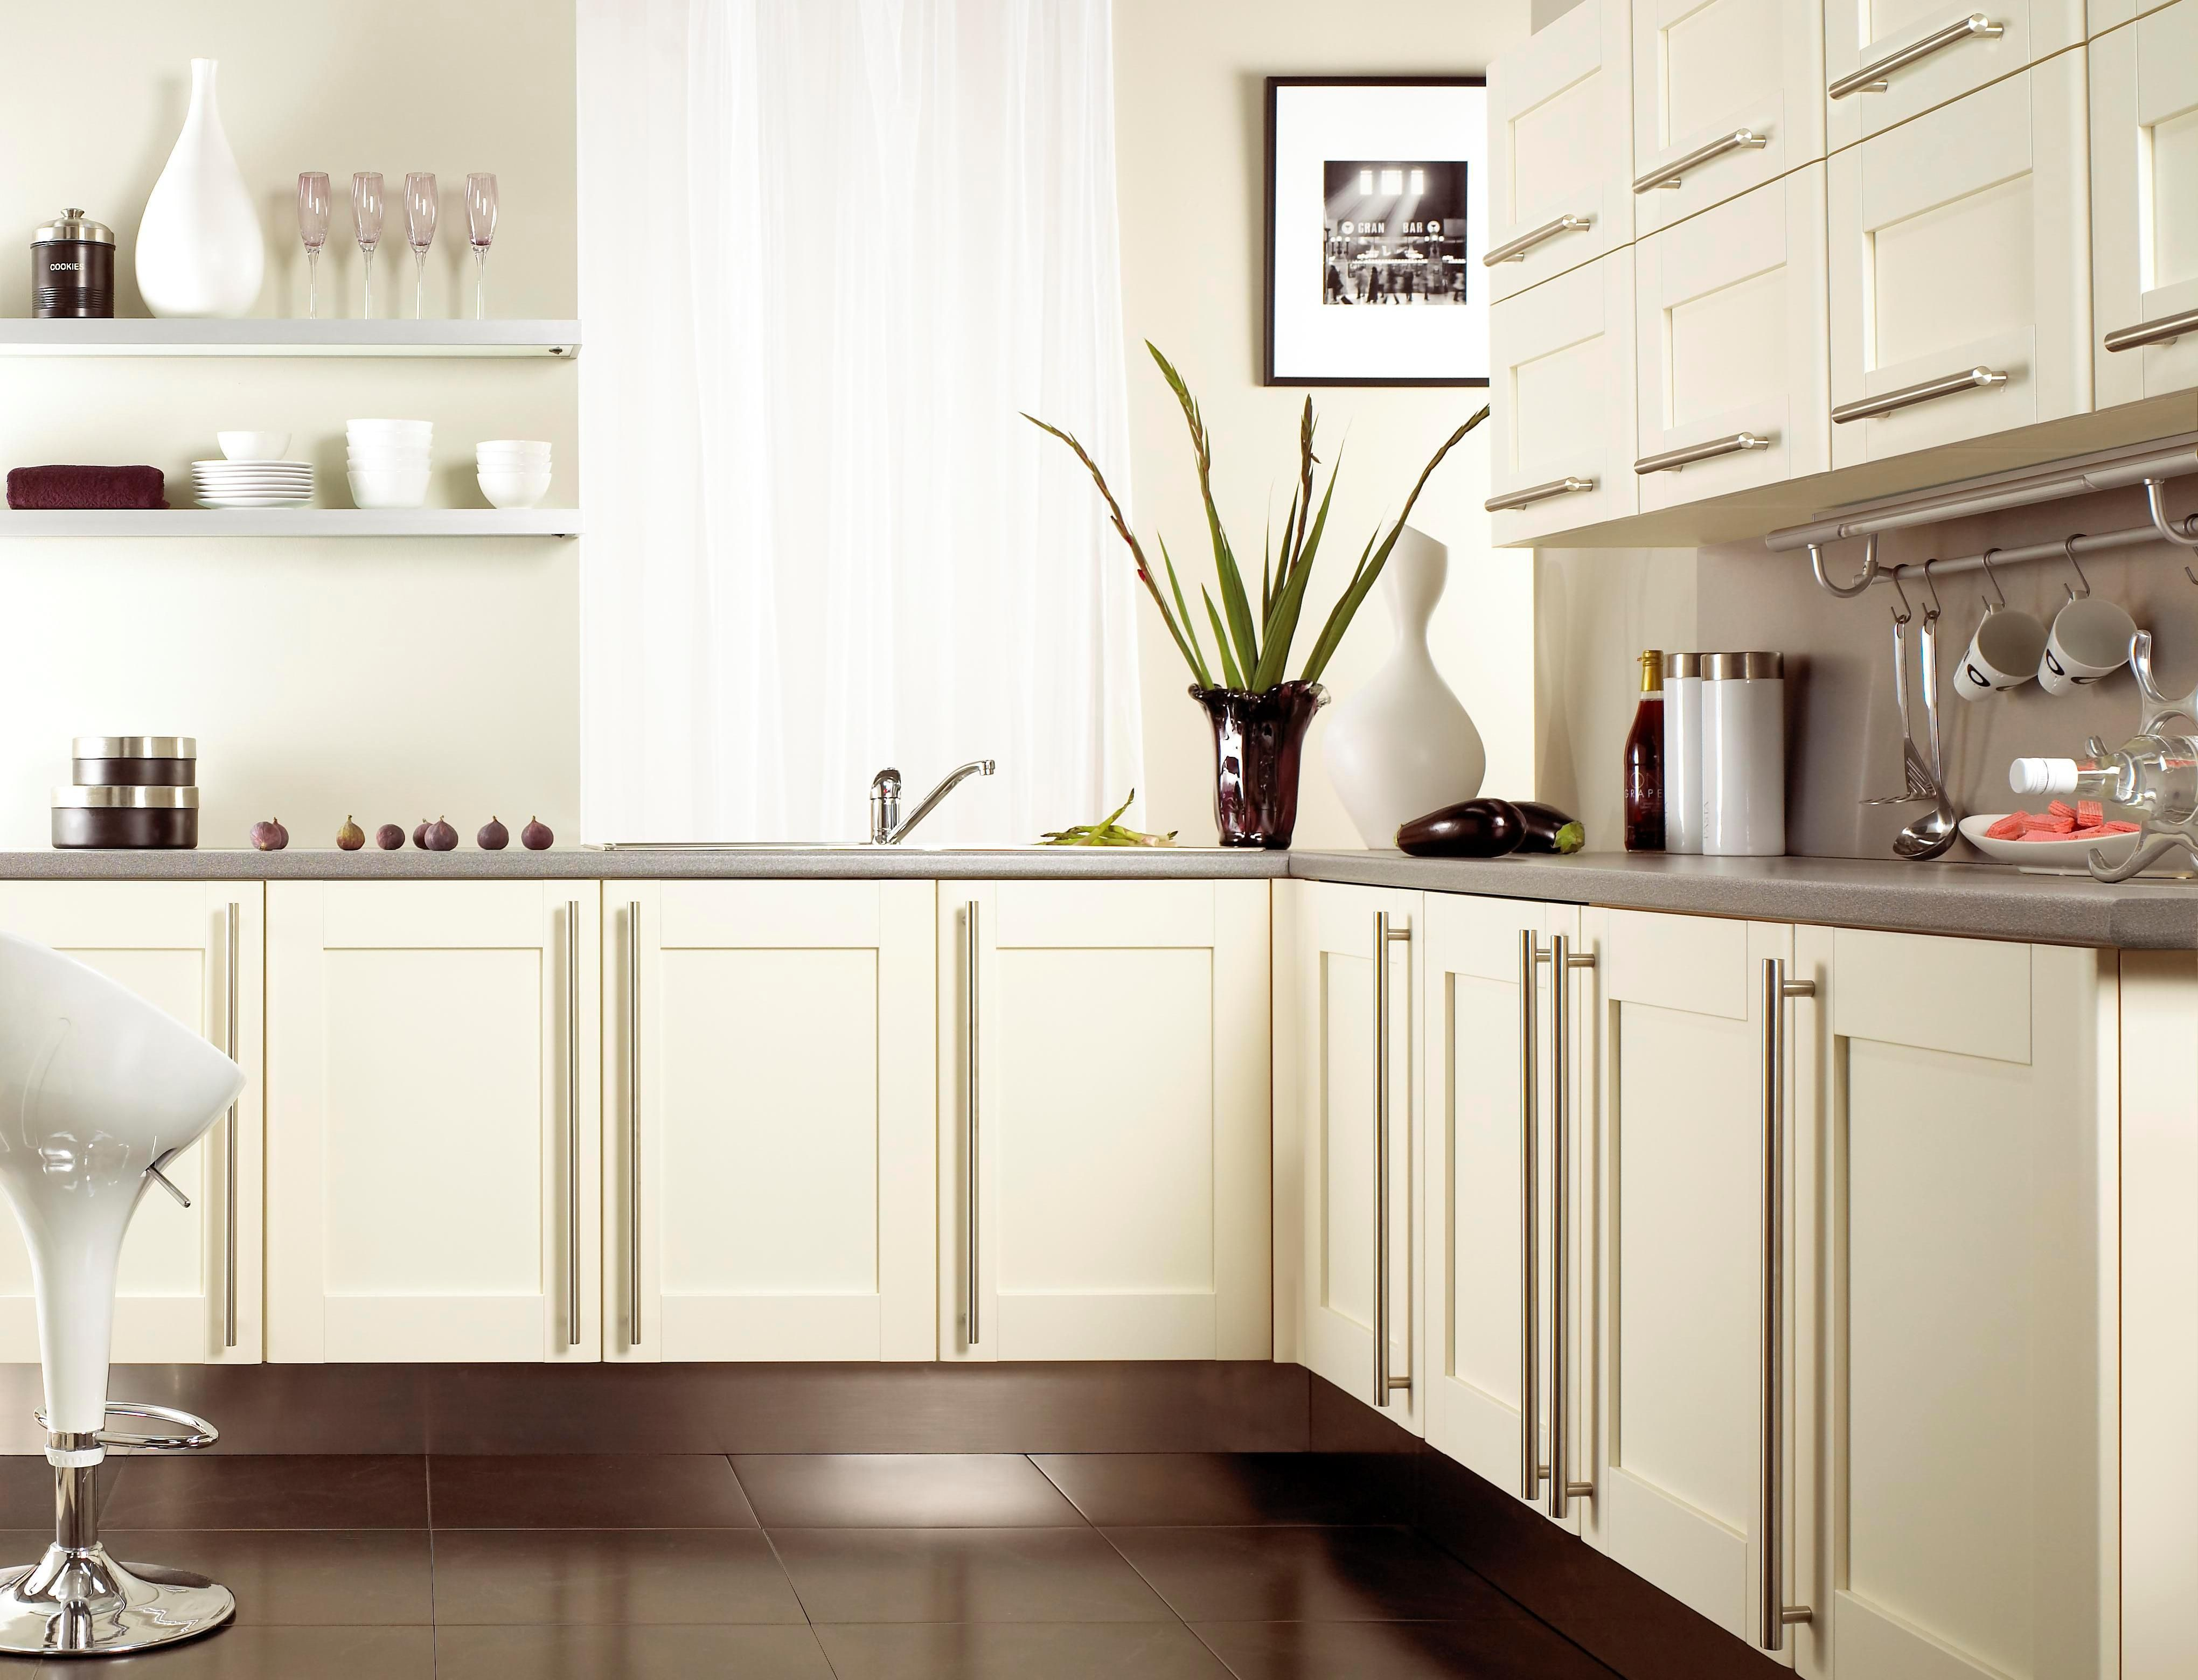 trendy antique kitchen arranging interior visualizations perfect ...